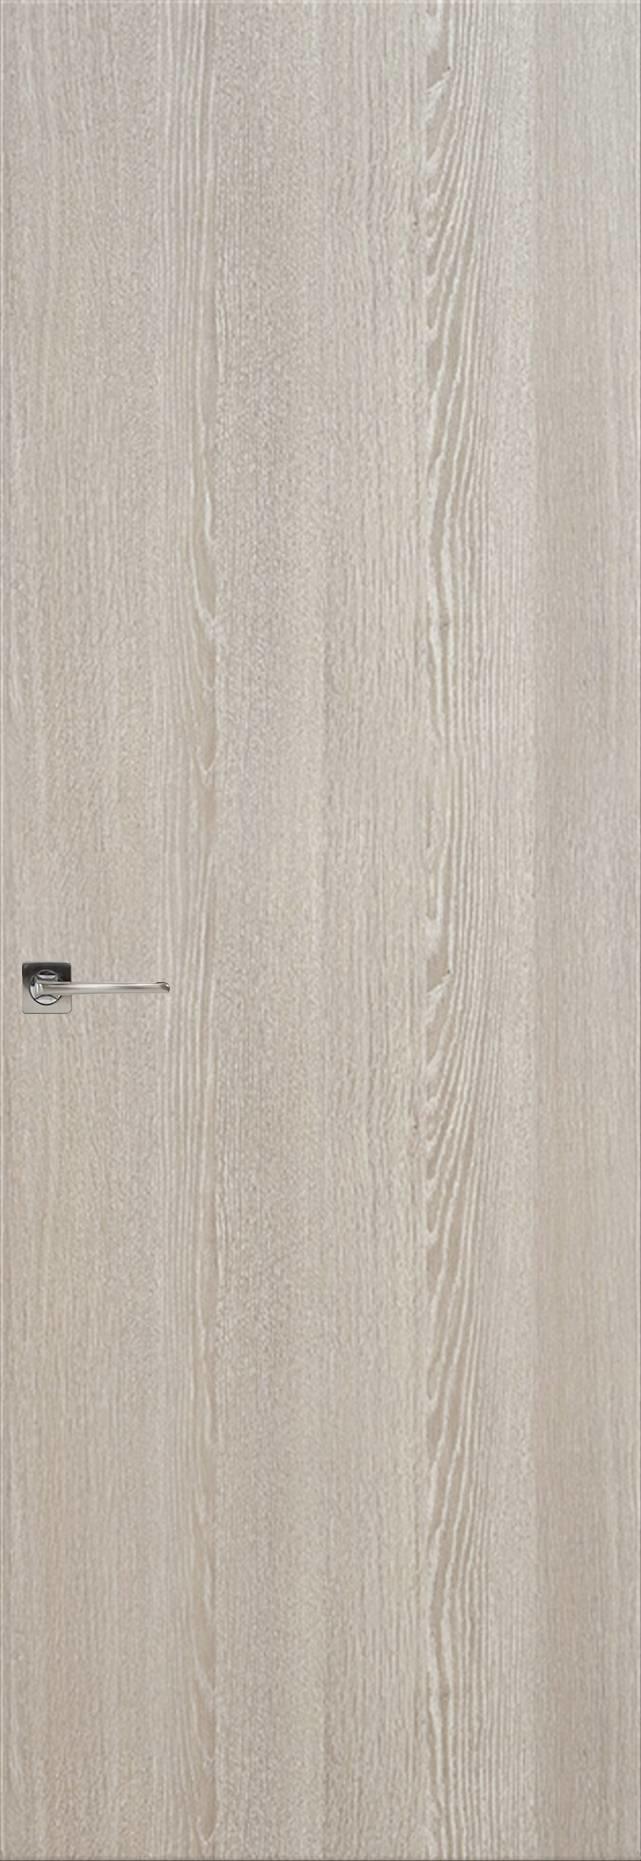 Tivoli А-1 Невидимка цвет - Серый дуб Без стекла (ДГ)